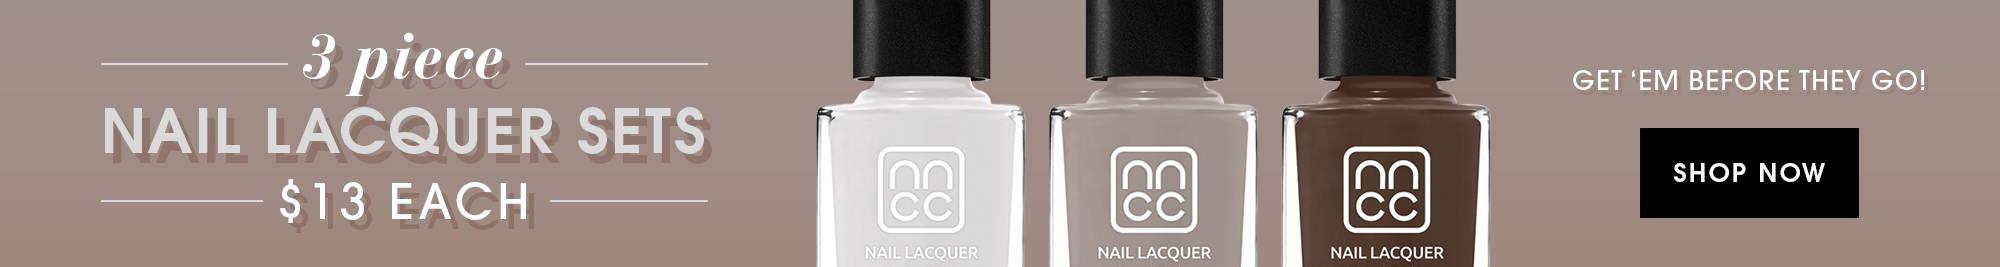 3 piece nail lacquer sets